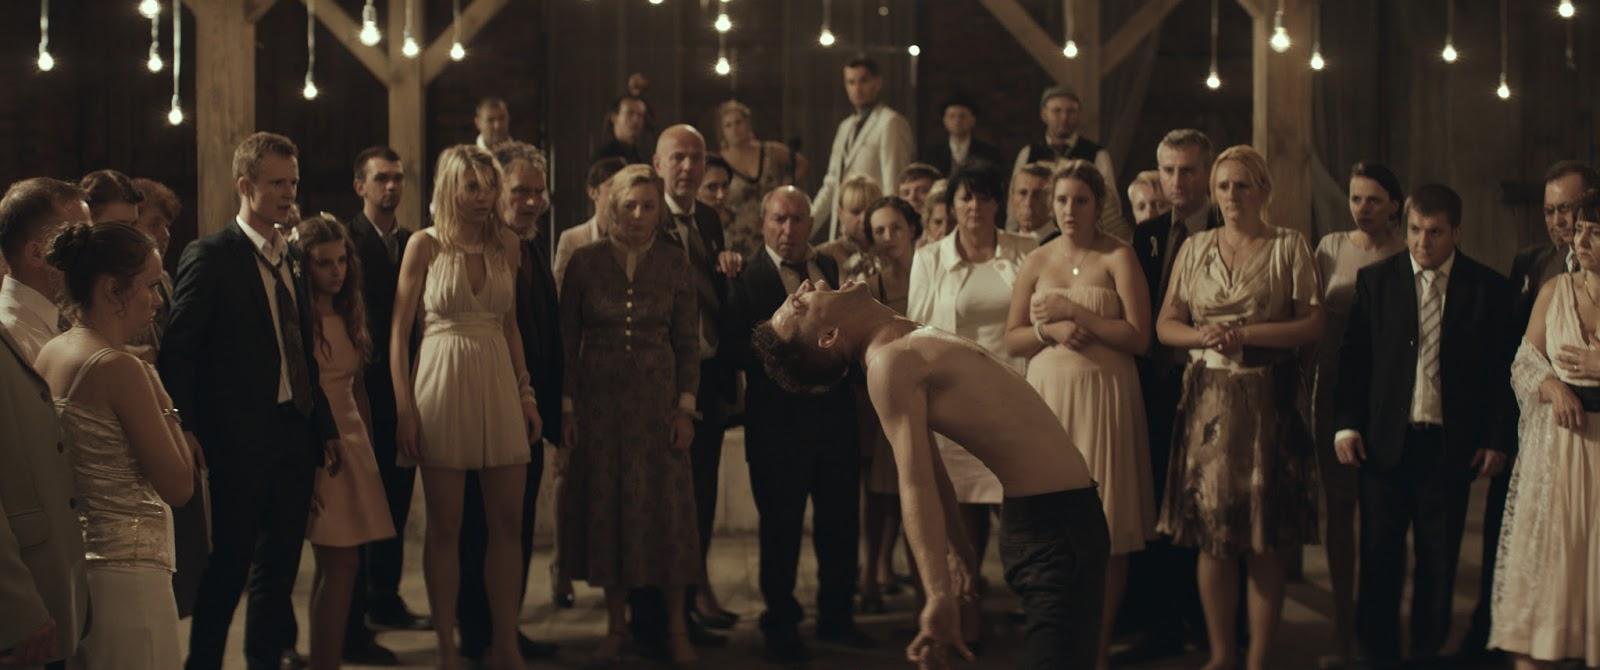 Demon último filme de Marcin Wrona tem estreia marcada para os Cinemas brasileiros